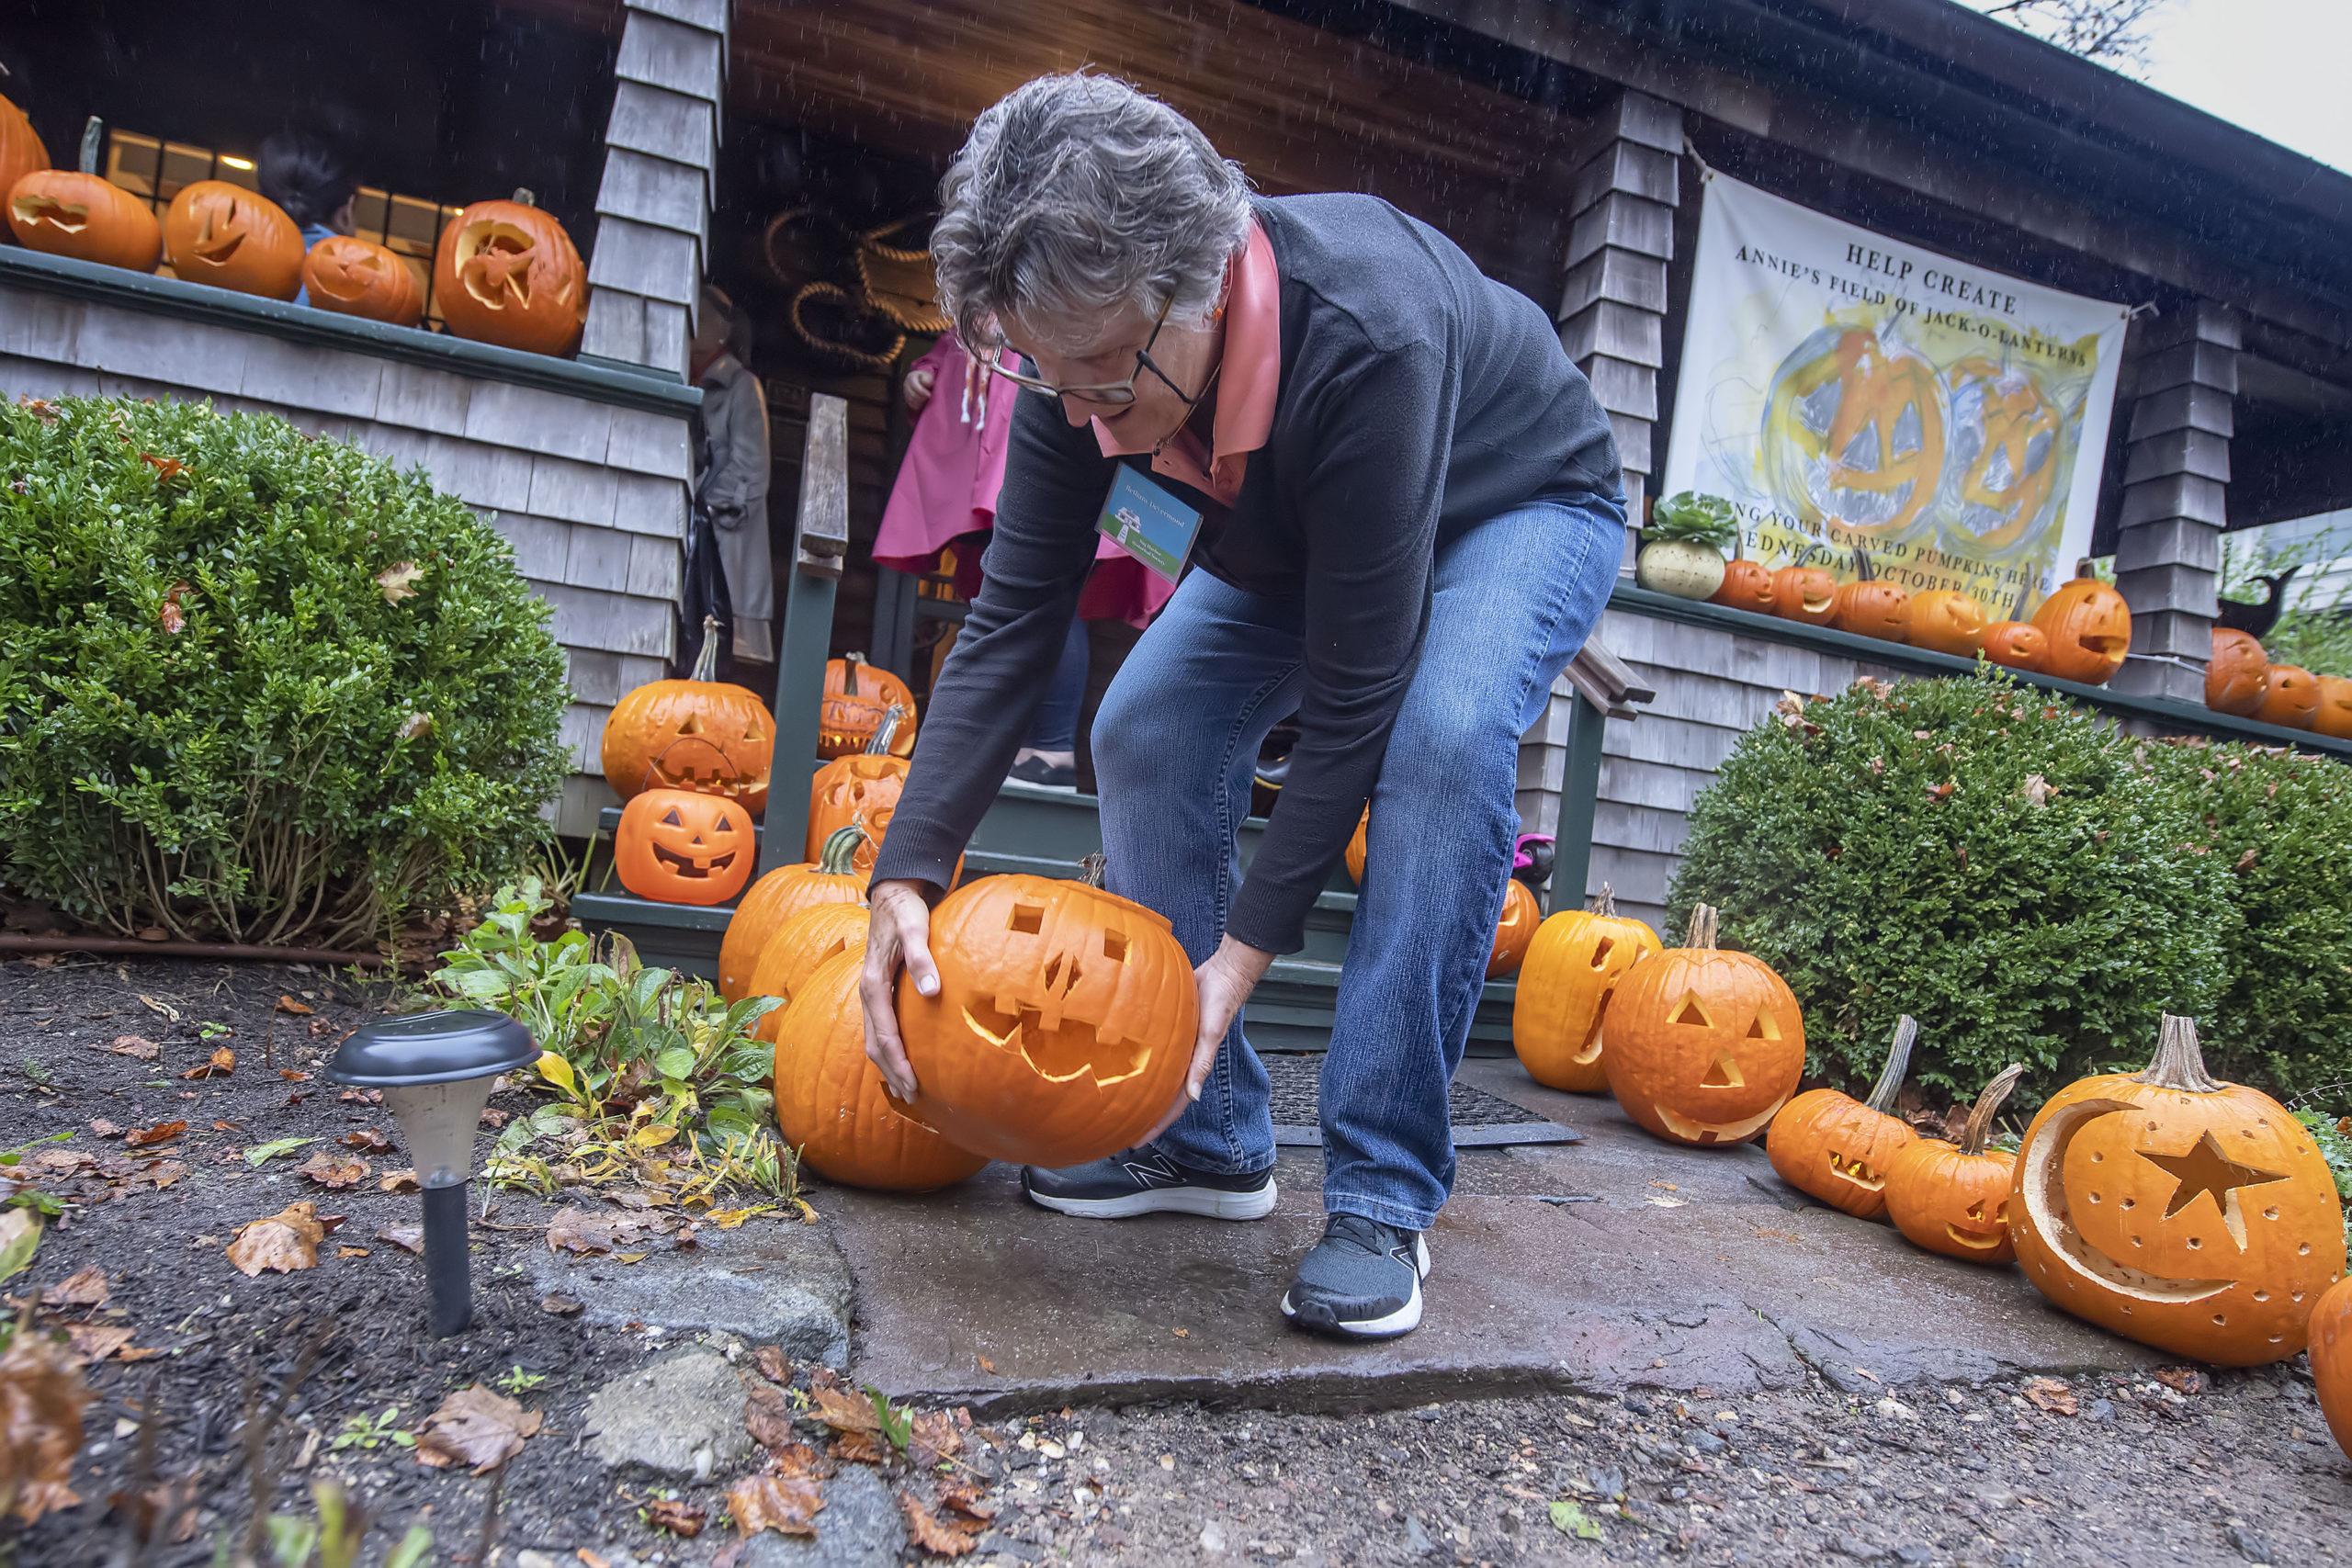 Sag Harbor Historical Society board member Bethany Deyermond arranges pumpkins at last year's